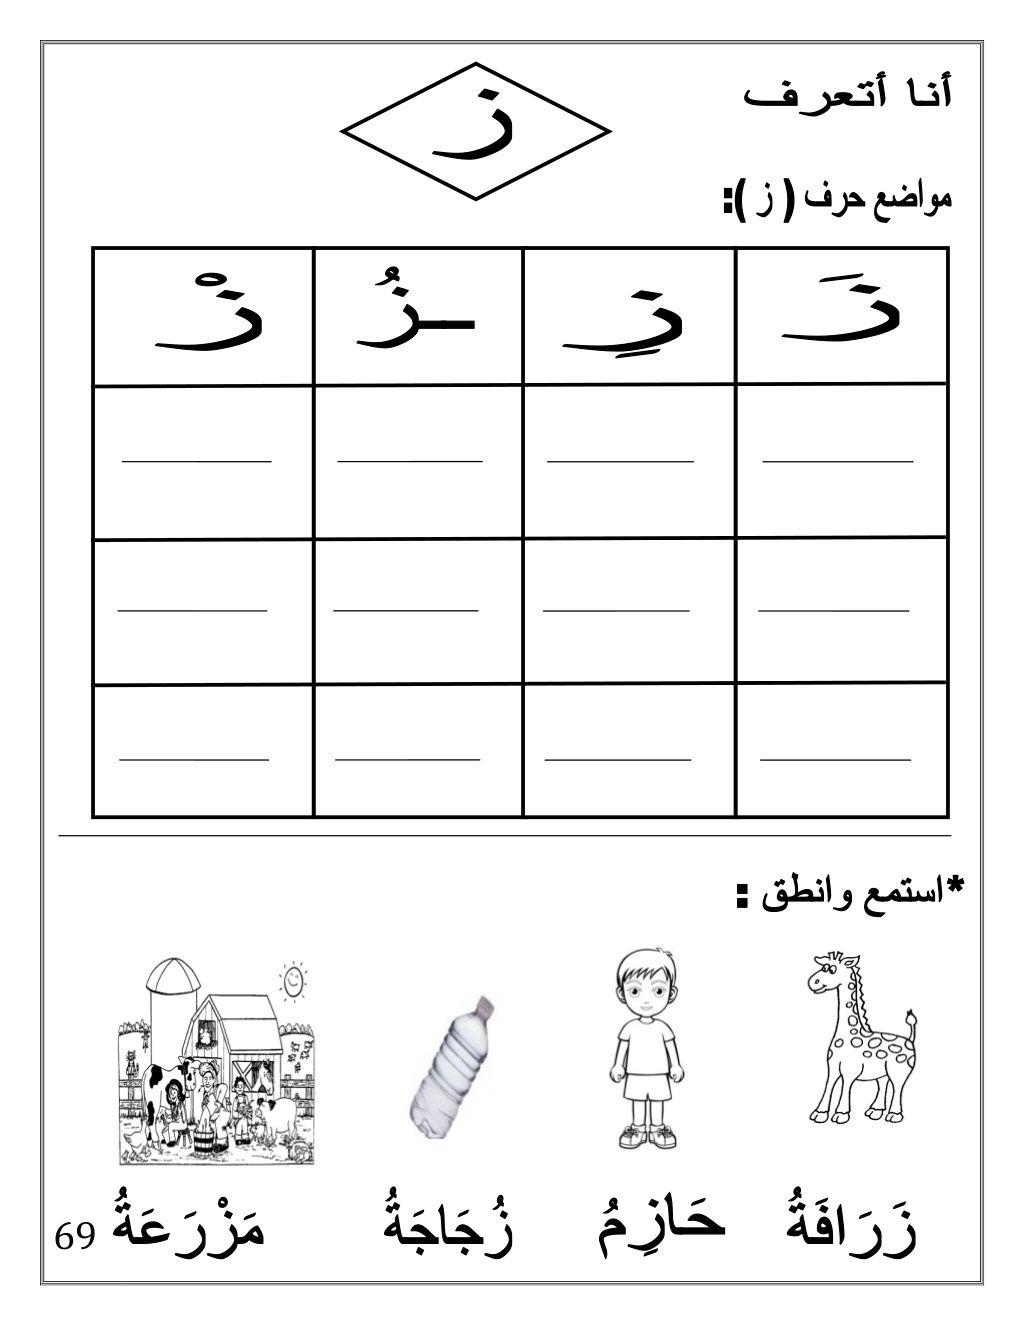 Arabic Booklet